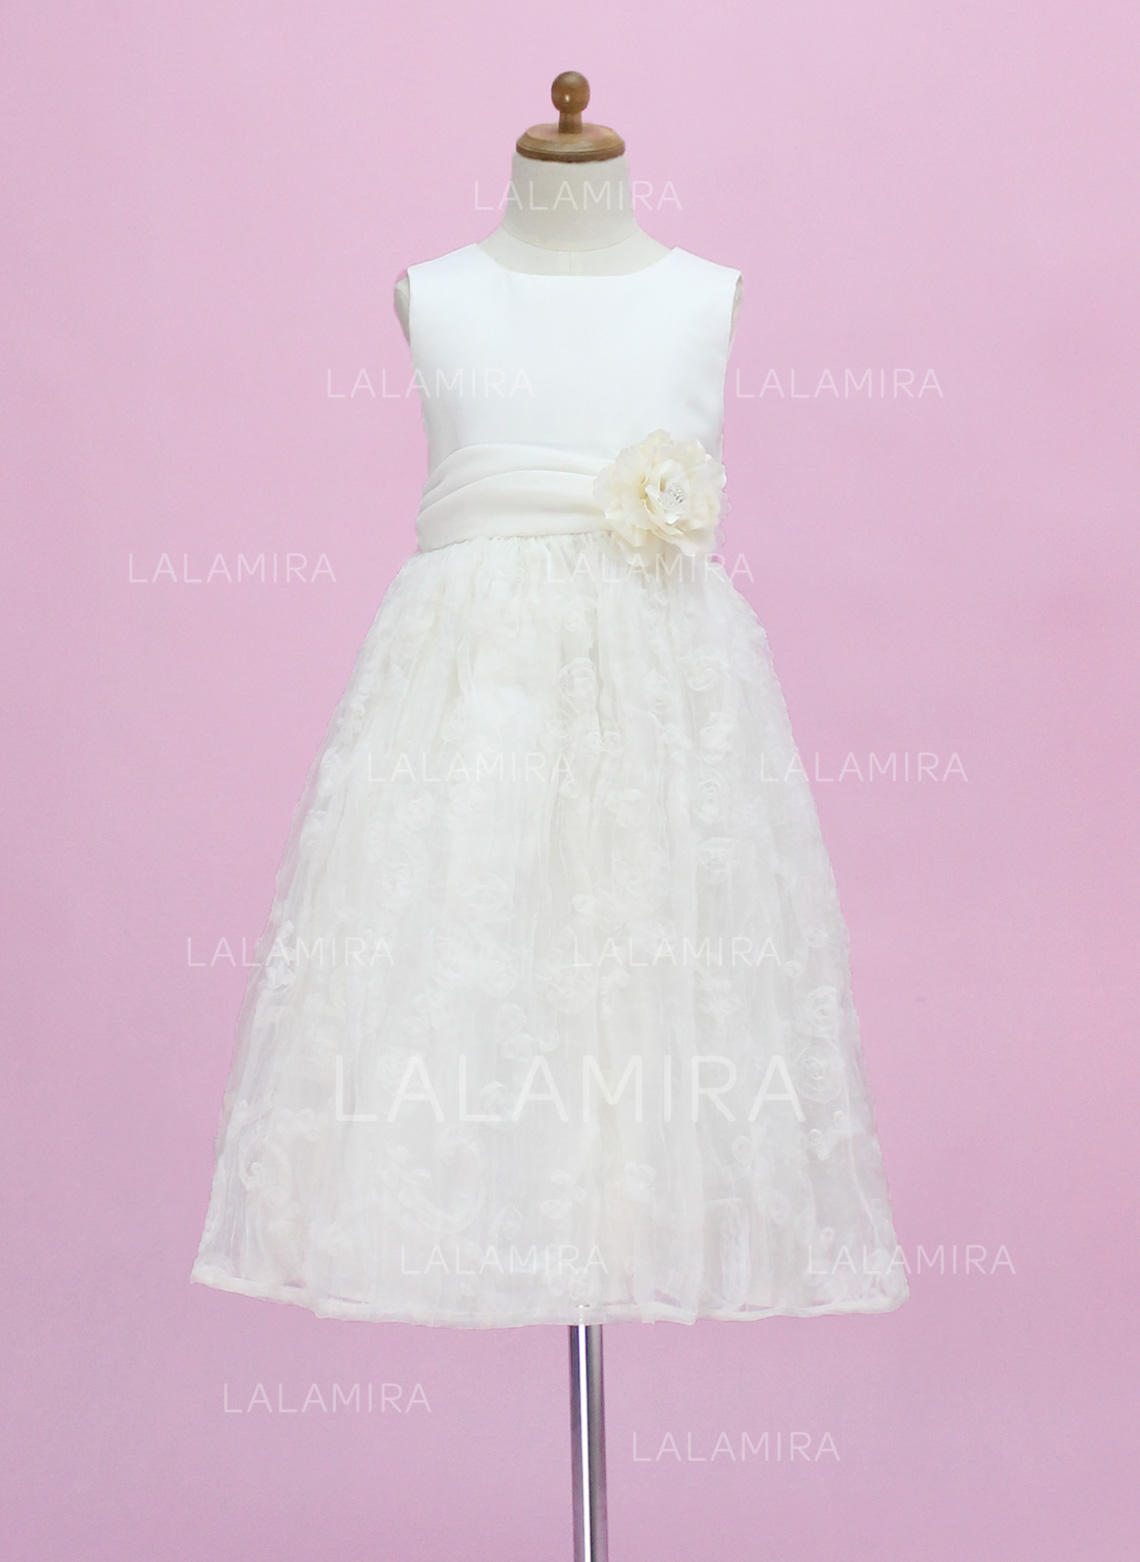 75dd74d9a Estonteante Decote redondo Vestidos princesa/ Formato A Vestidos de daminha  Longuete Cetim/Renda Sem. Loading zoom. Carregando